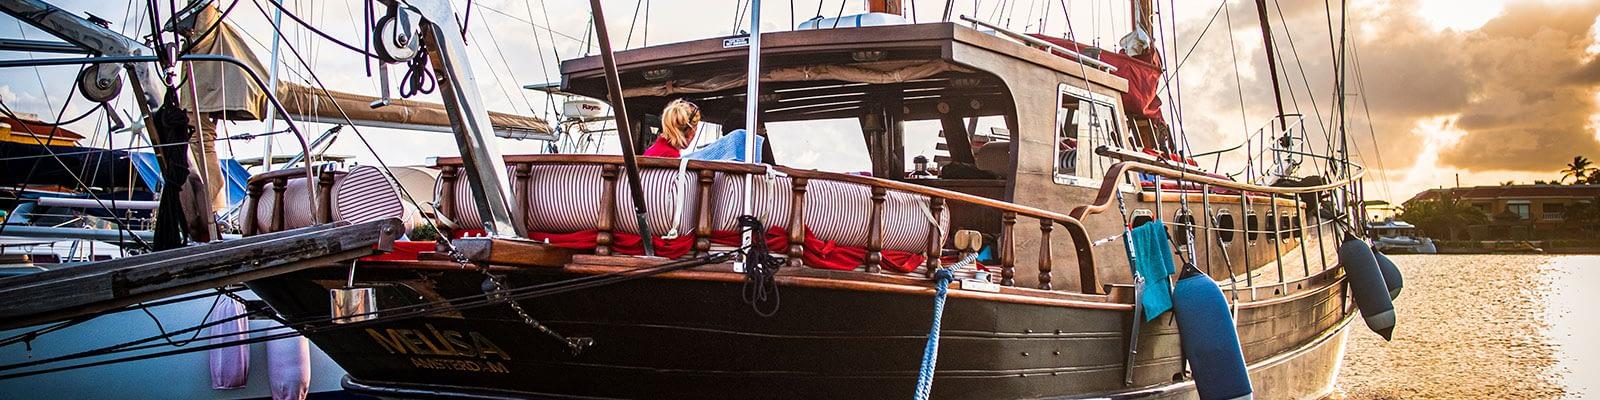 melisa-sailing-slider-img-3